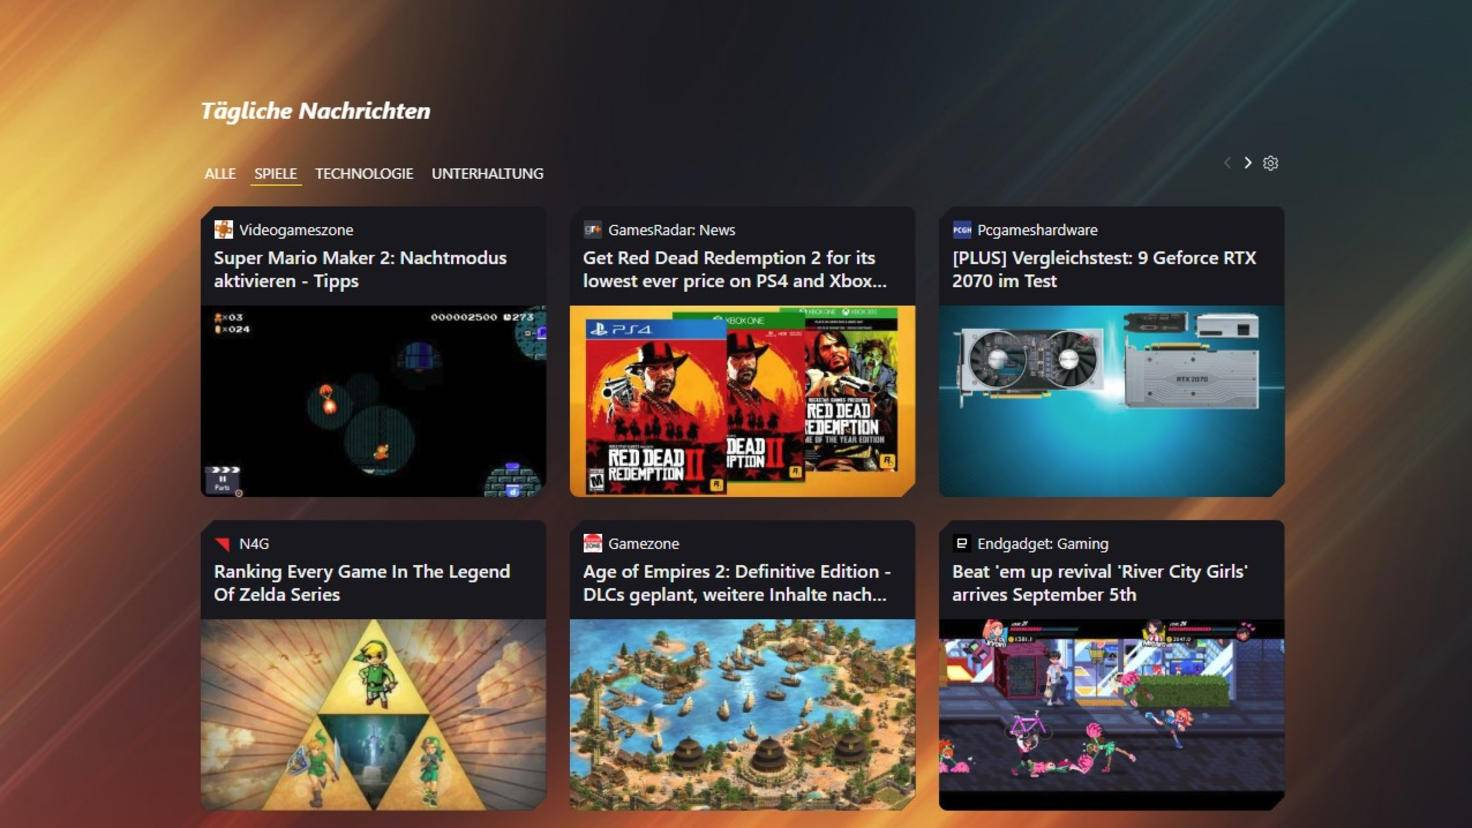 Dank Opera GX verpasst Du nie wieder wichtige Gaming-News.